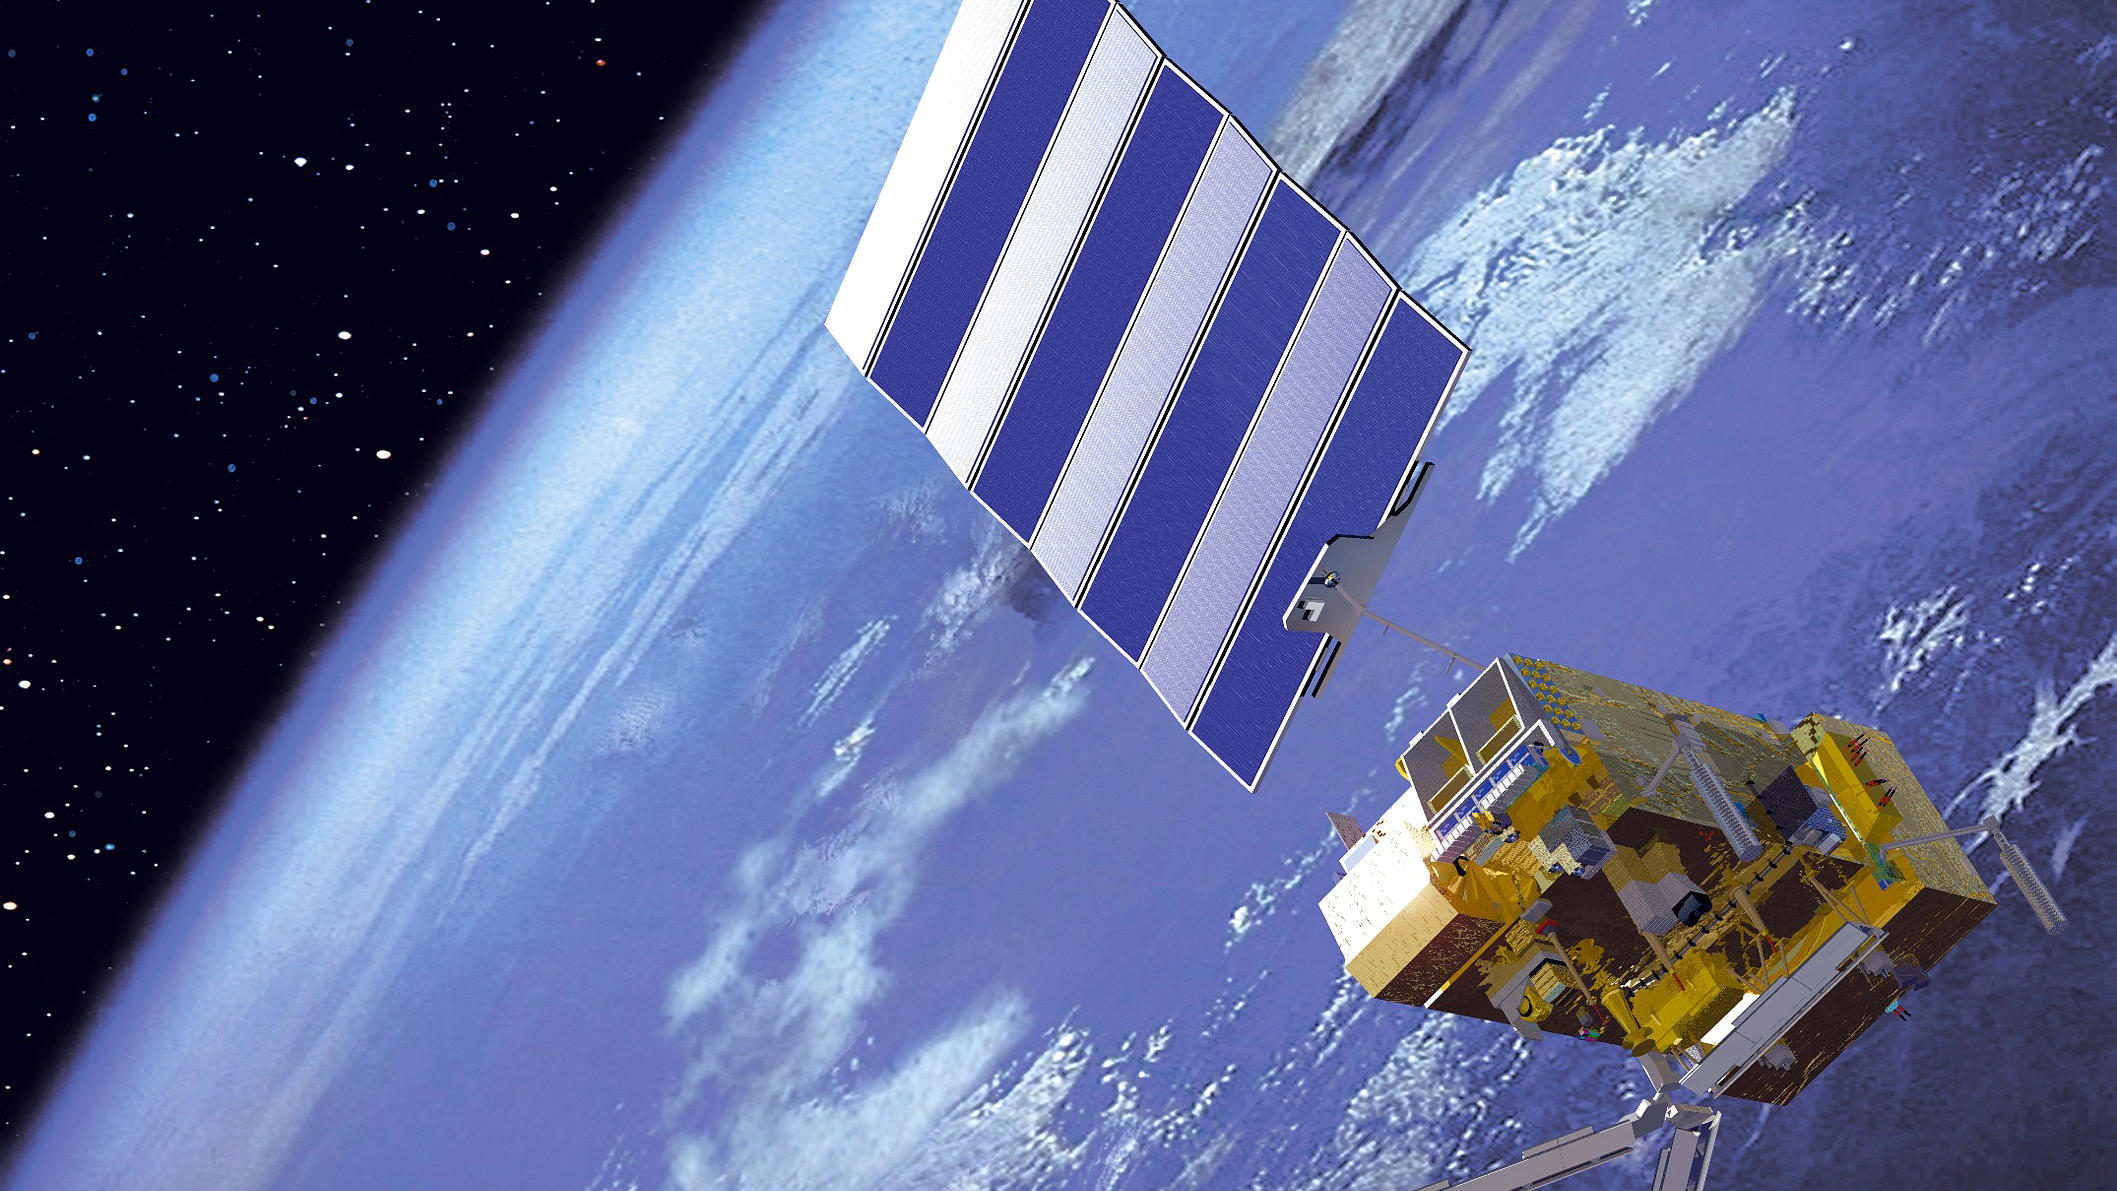 Wetter Satelliten Radar